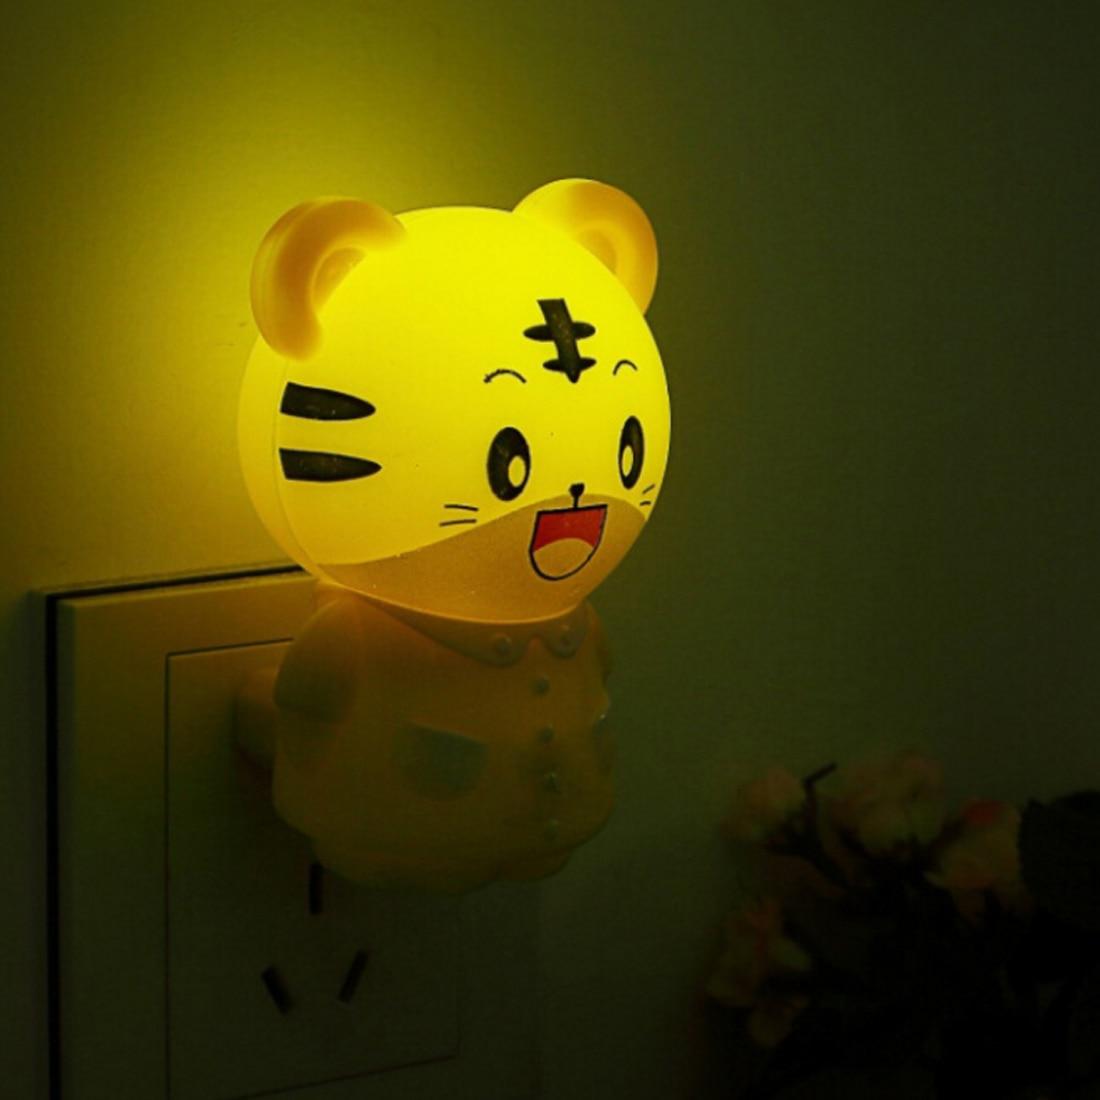 Sleeping Night Lamp Novelty Lights US Plug LED Night Light In Tiger / Bear Cartoon Style Baby Lights LED Bulb